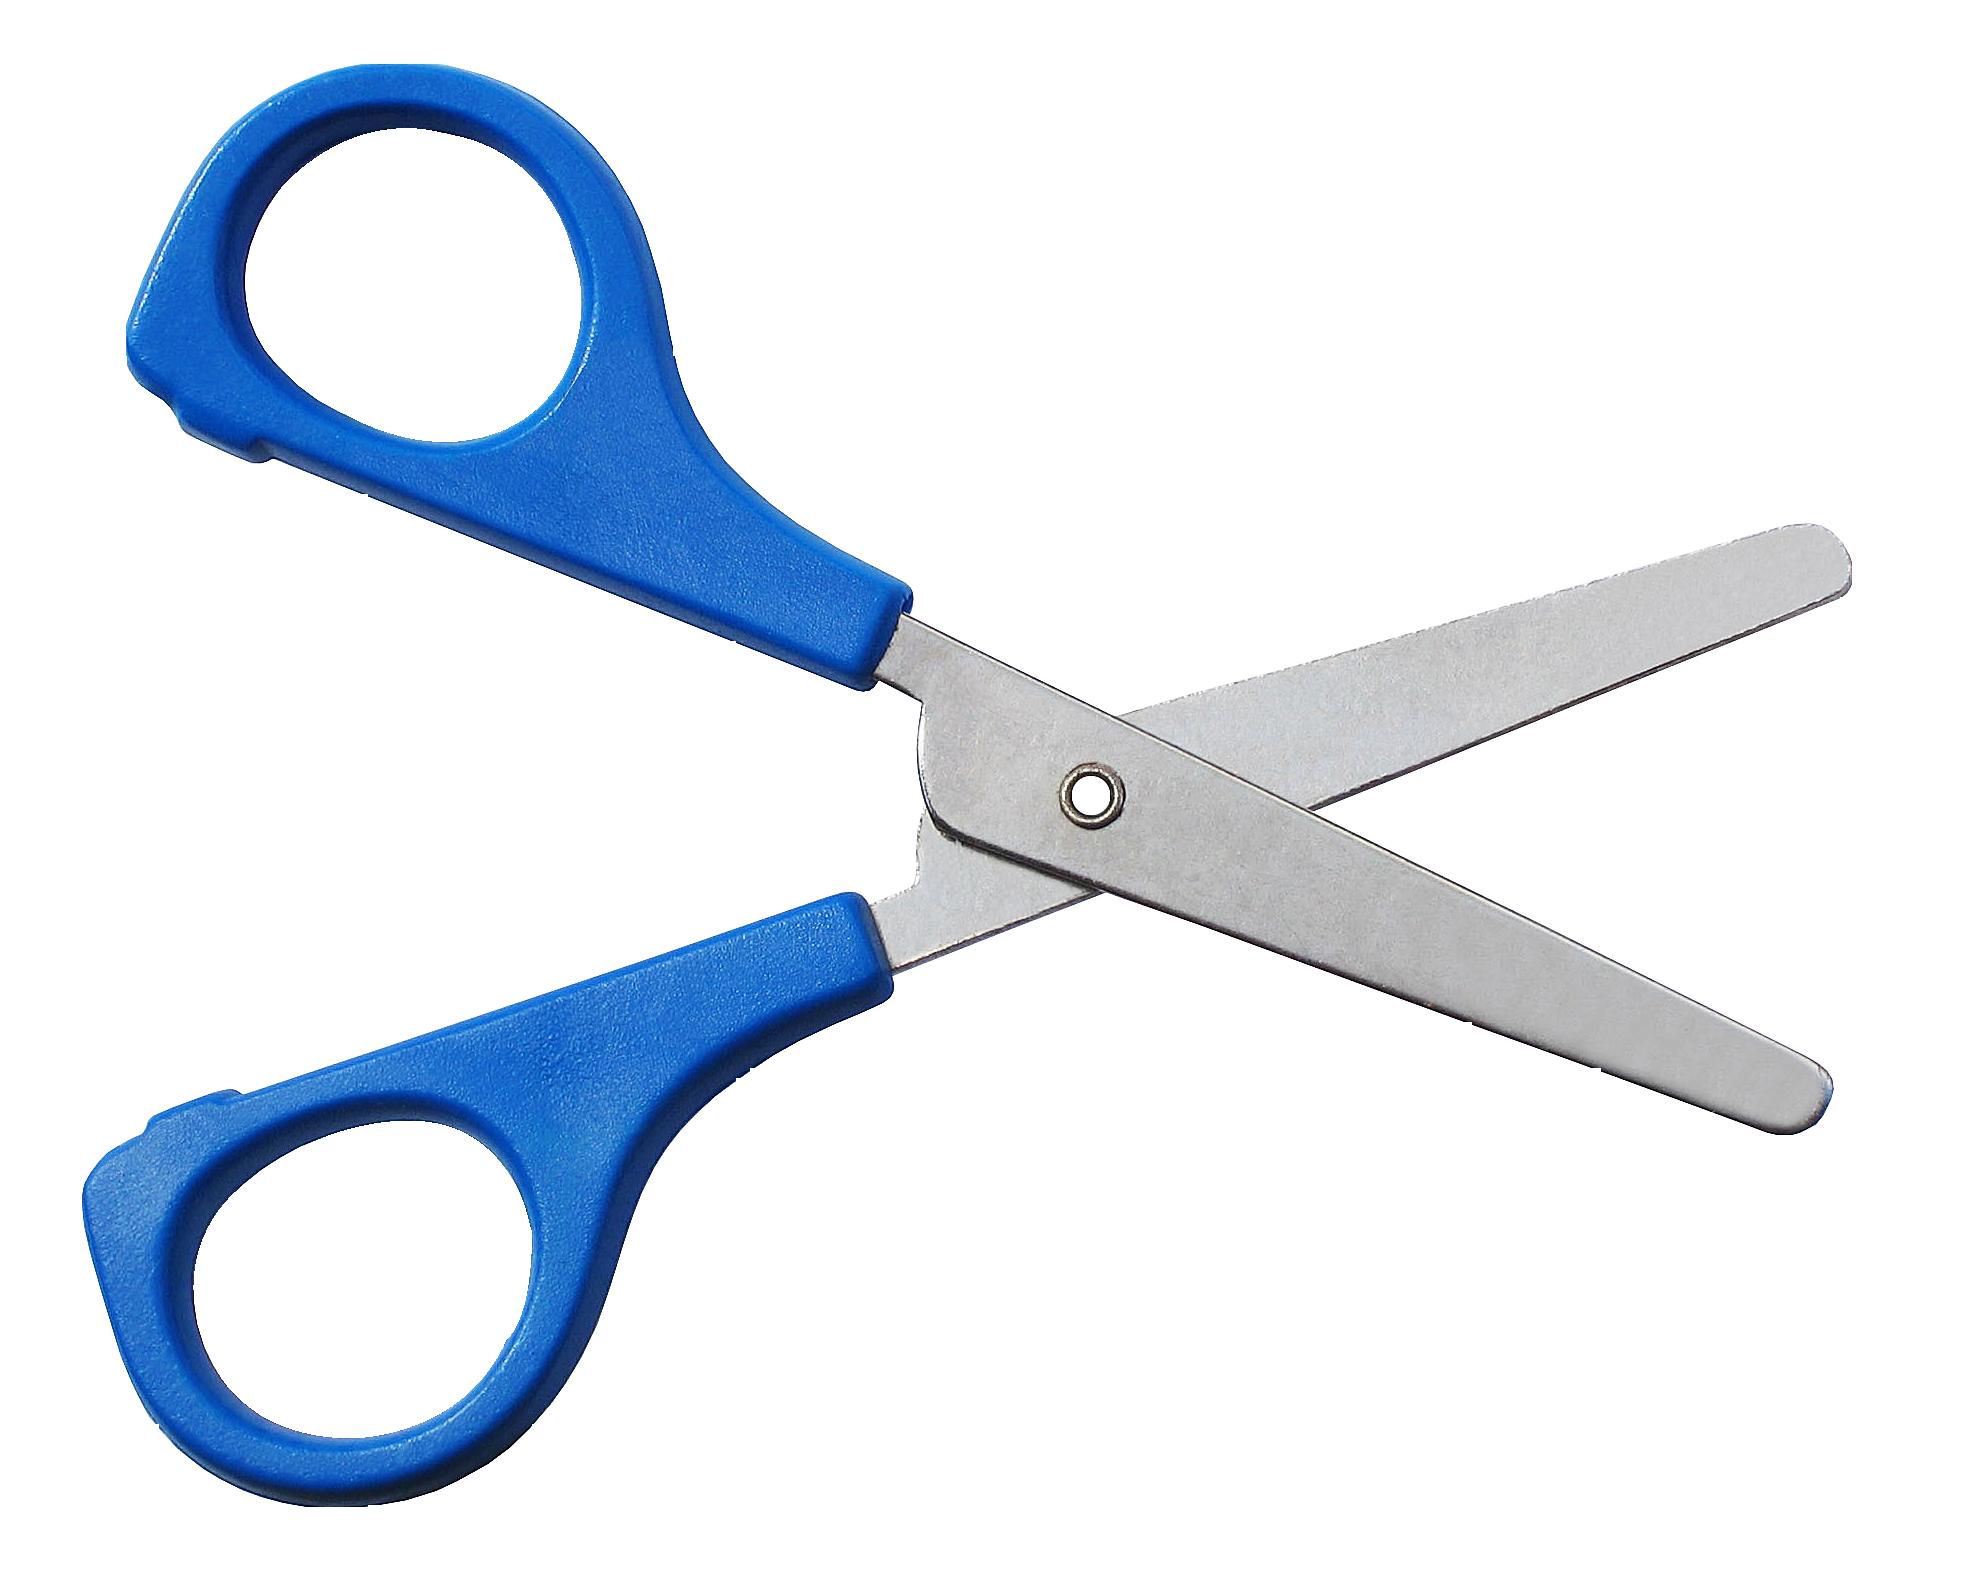 Scissors PNG Transparent Image.